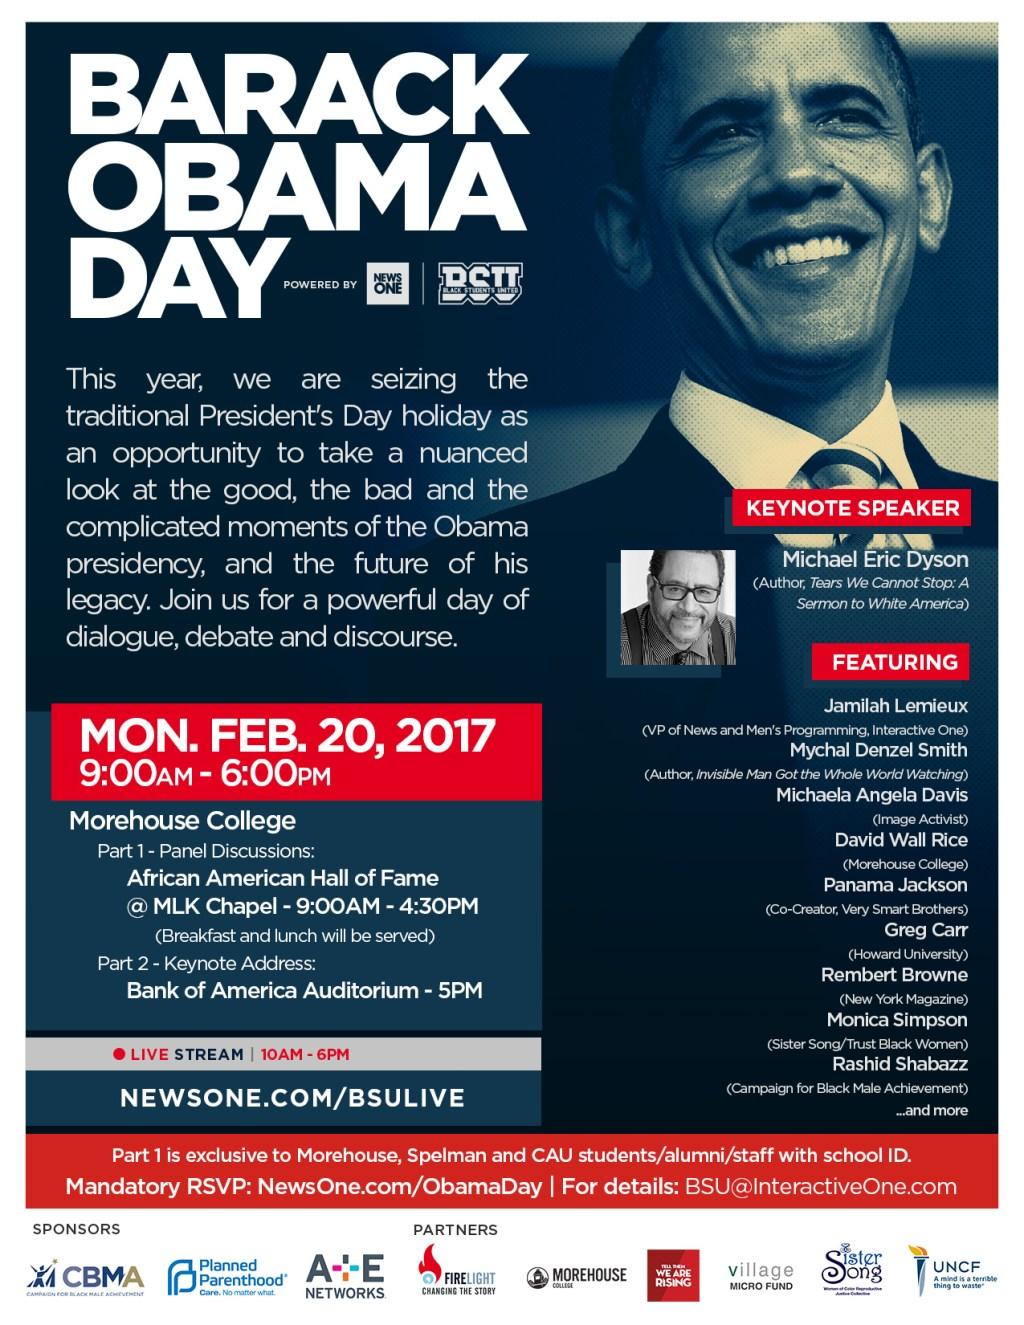 barack-obama-day-generic